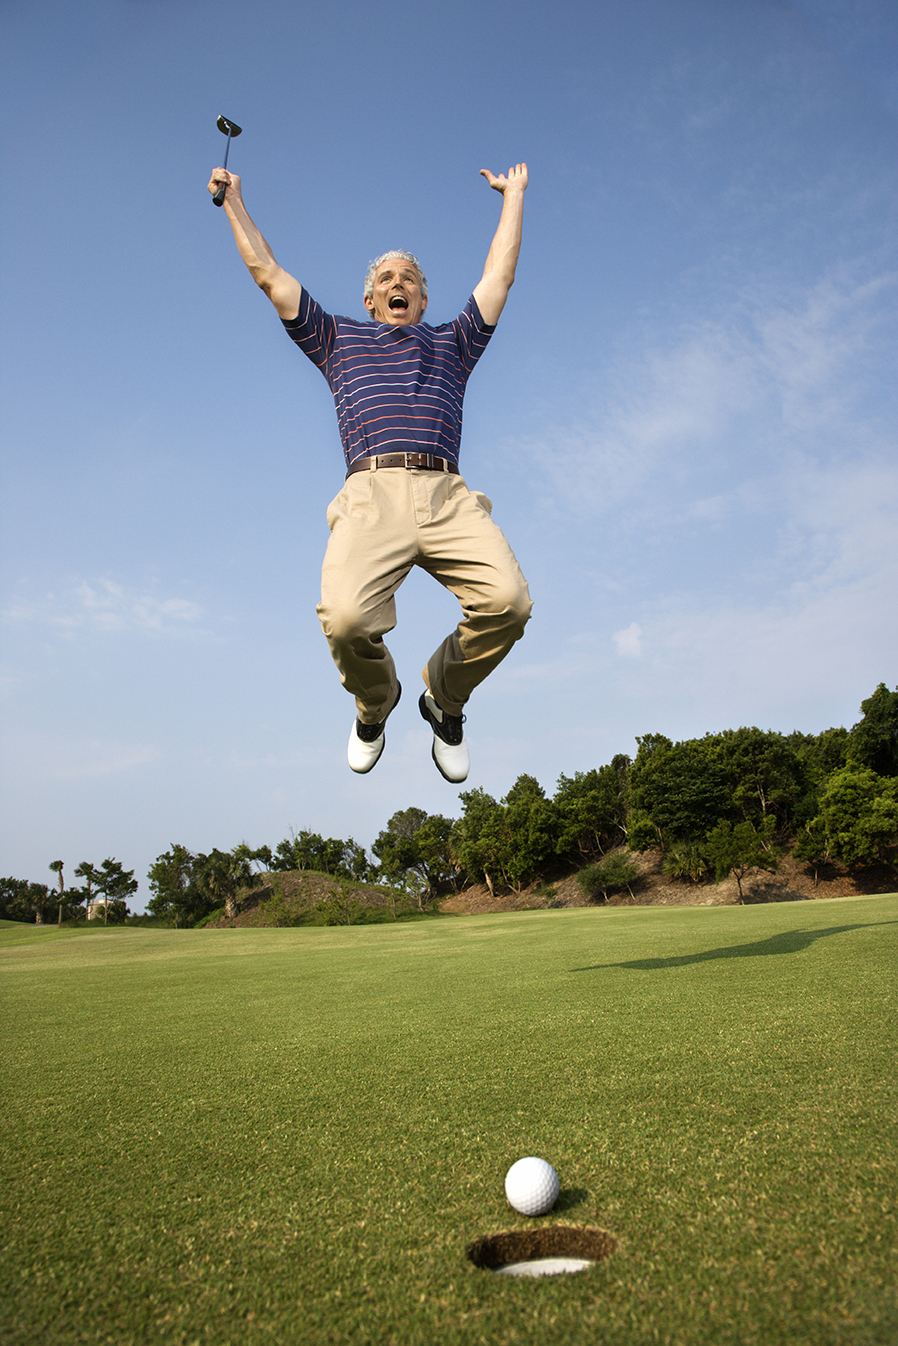 Pin High - jumping golfer